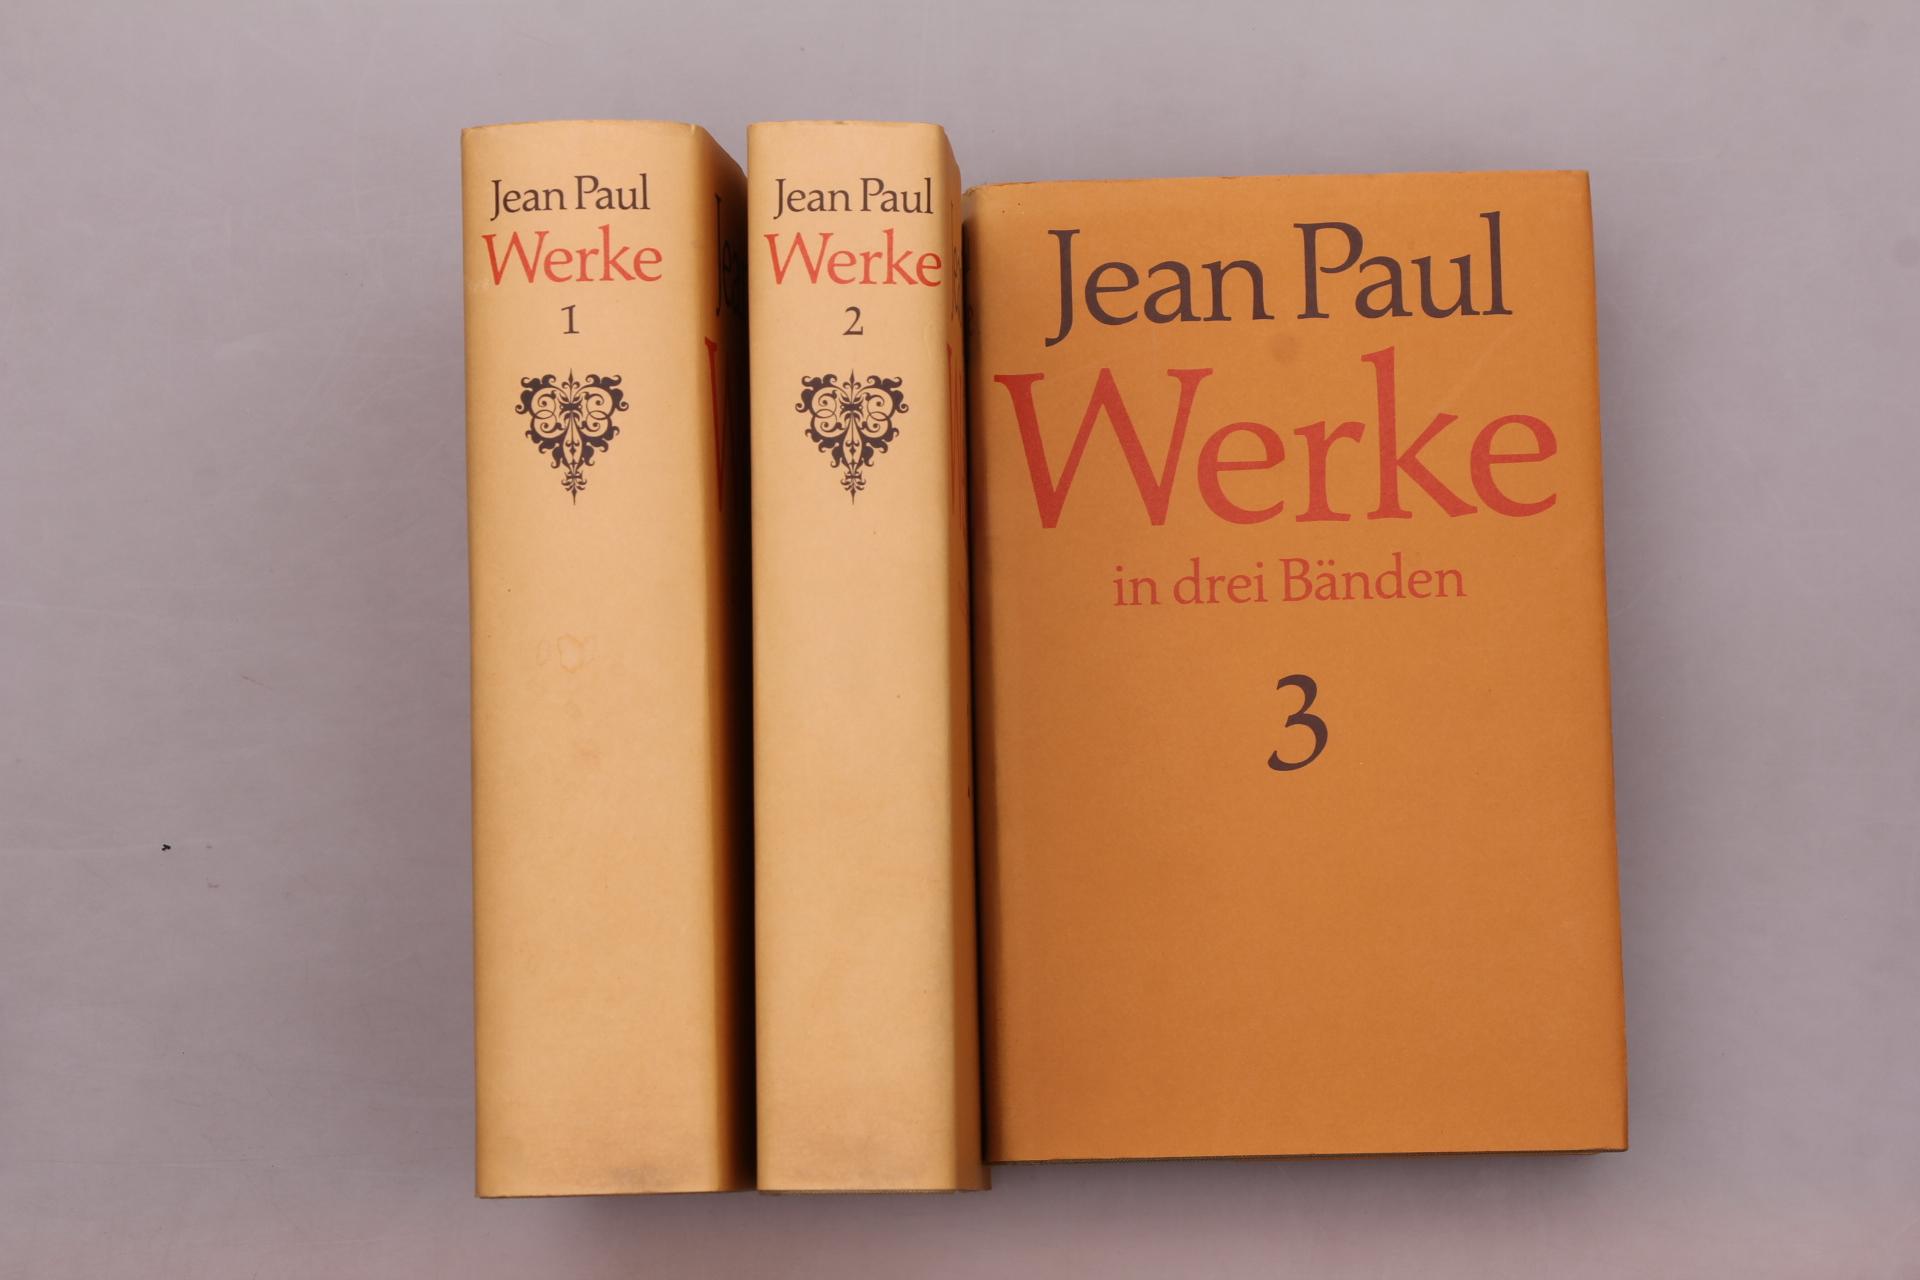 JEAN PAUL WERKE IN DREI BÄNDEN.: Hrsg.]: Miller, Norbert